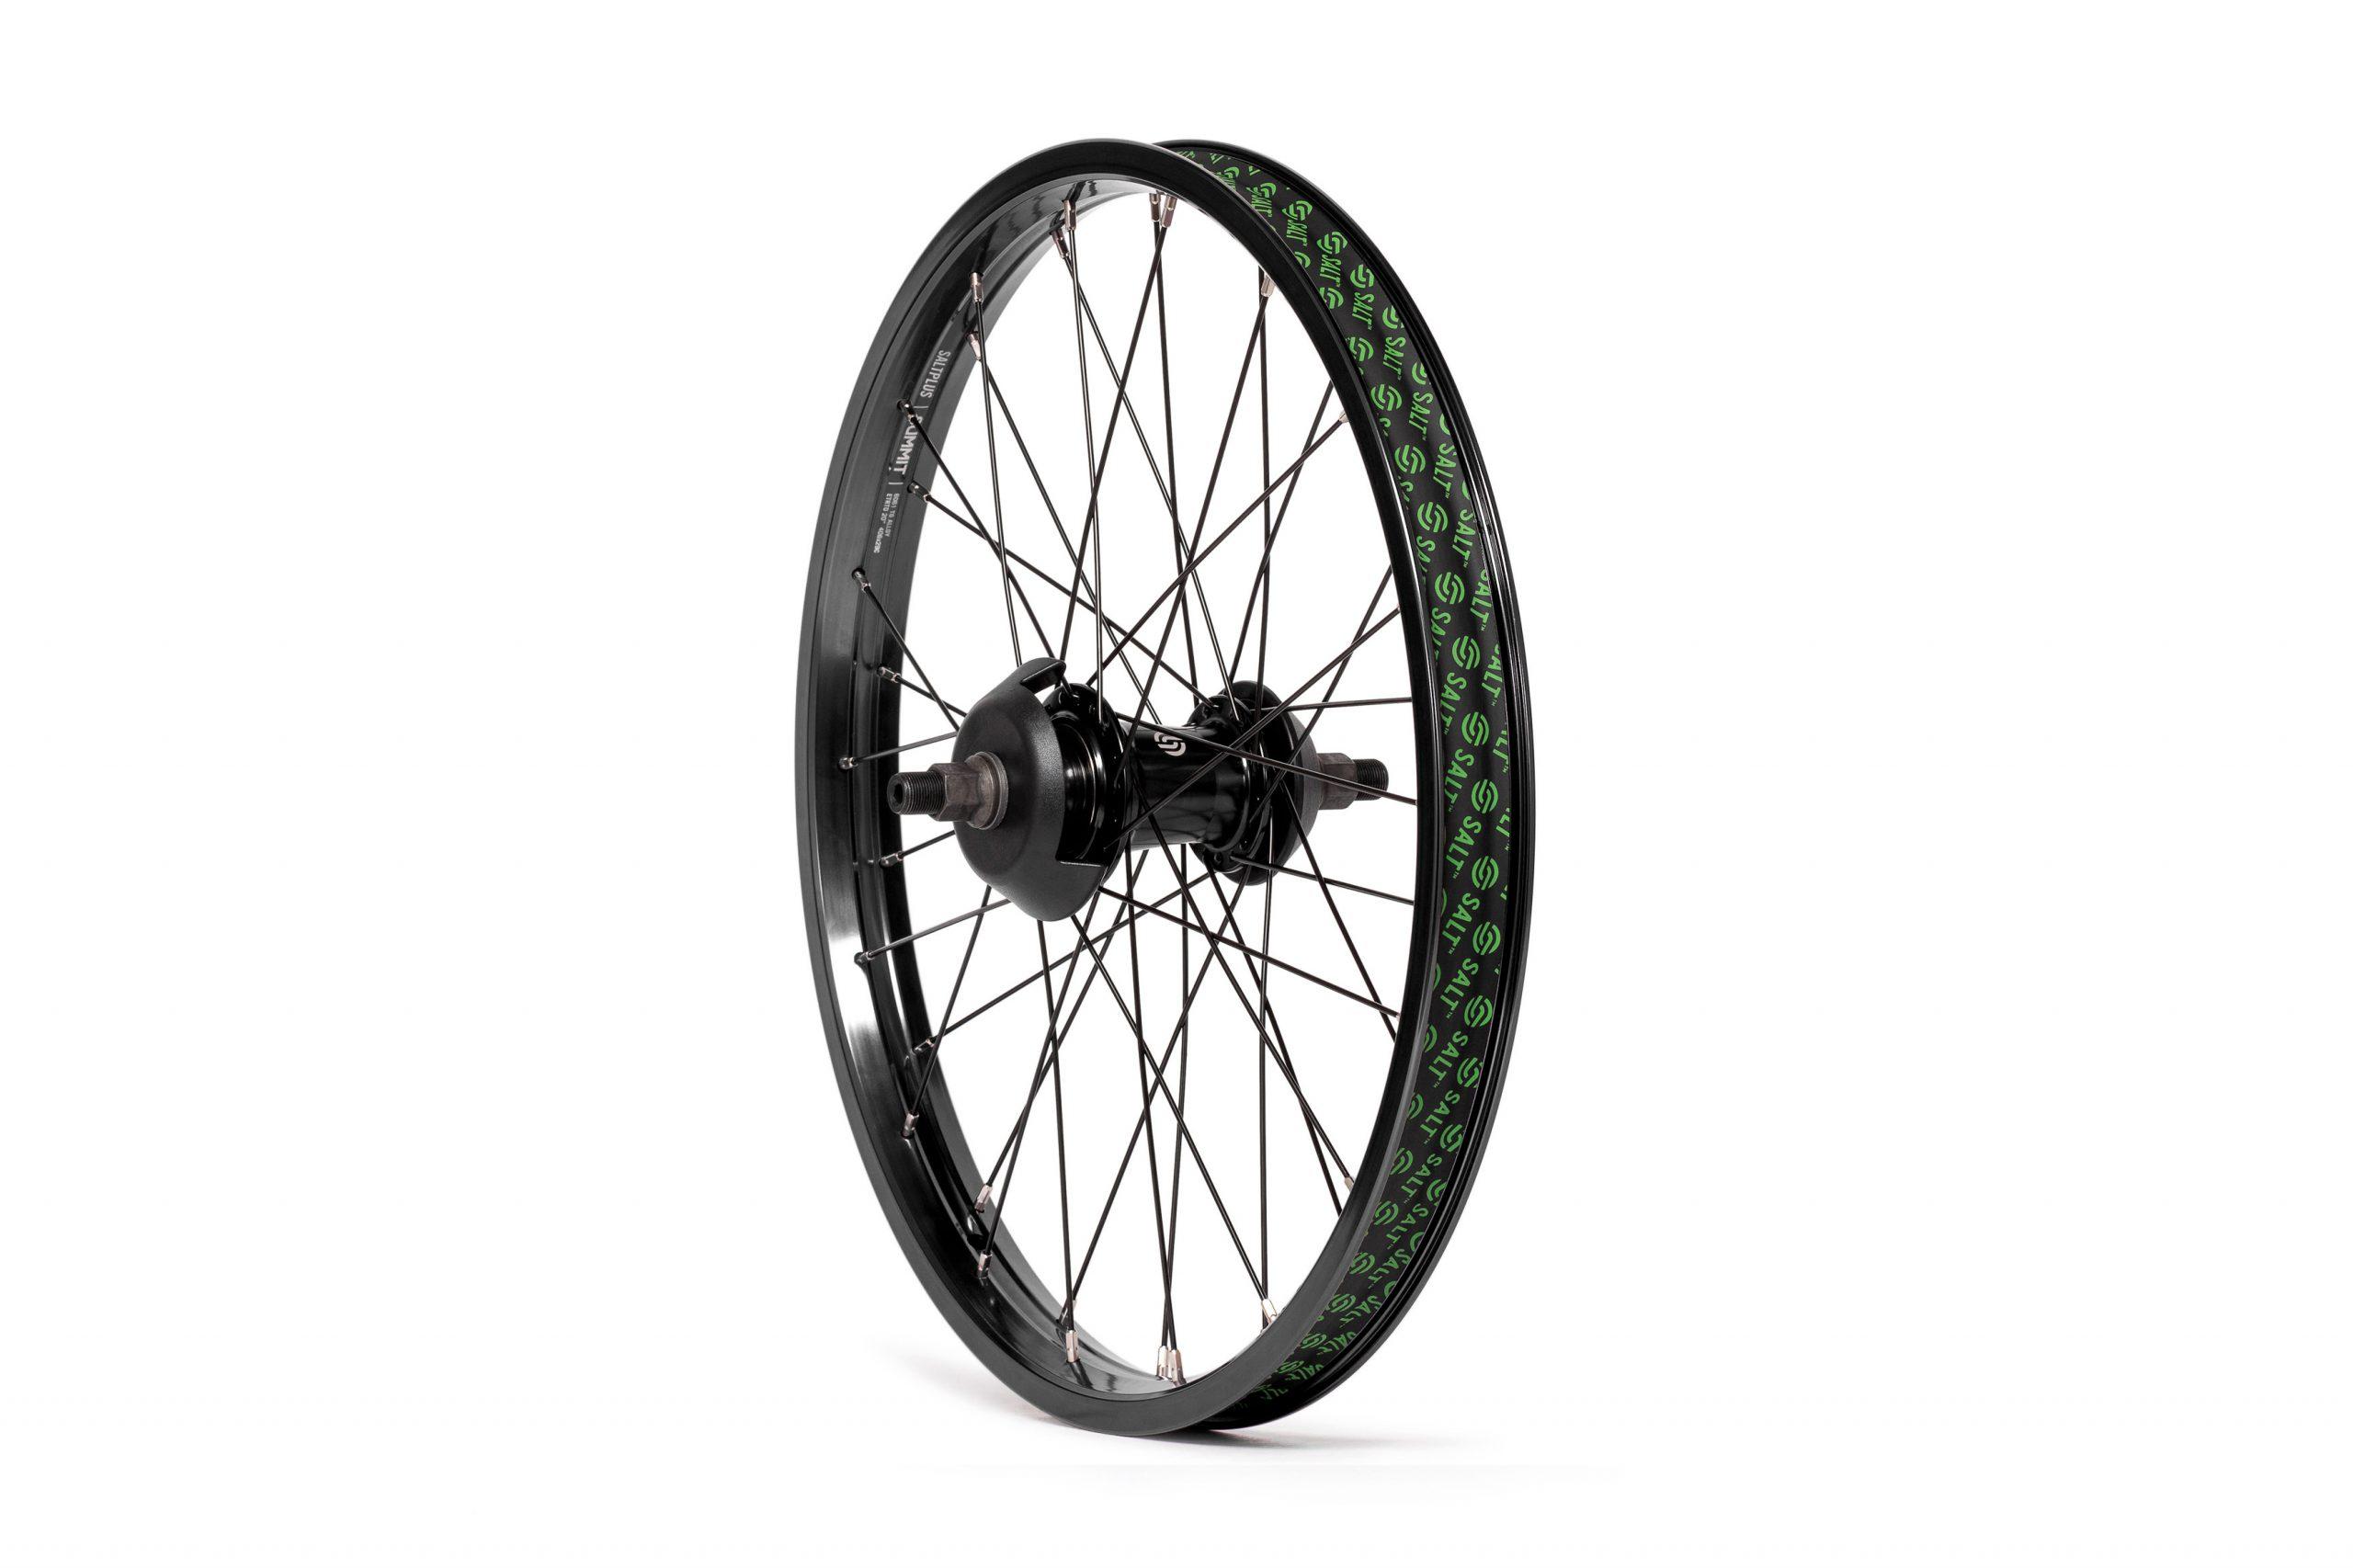 Salt_Everest_FC_rear_wheel_black_02